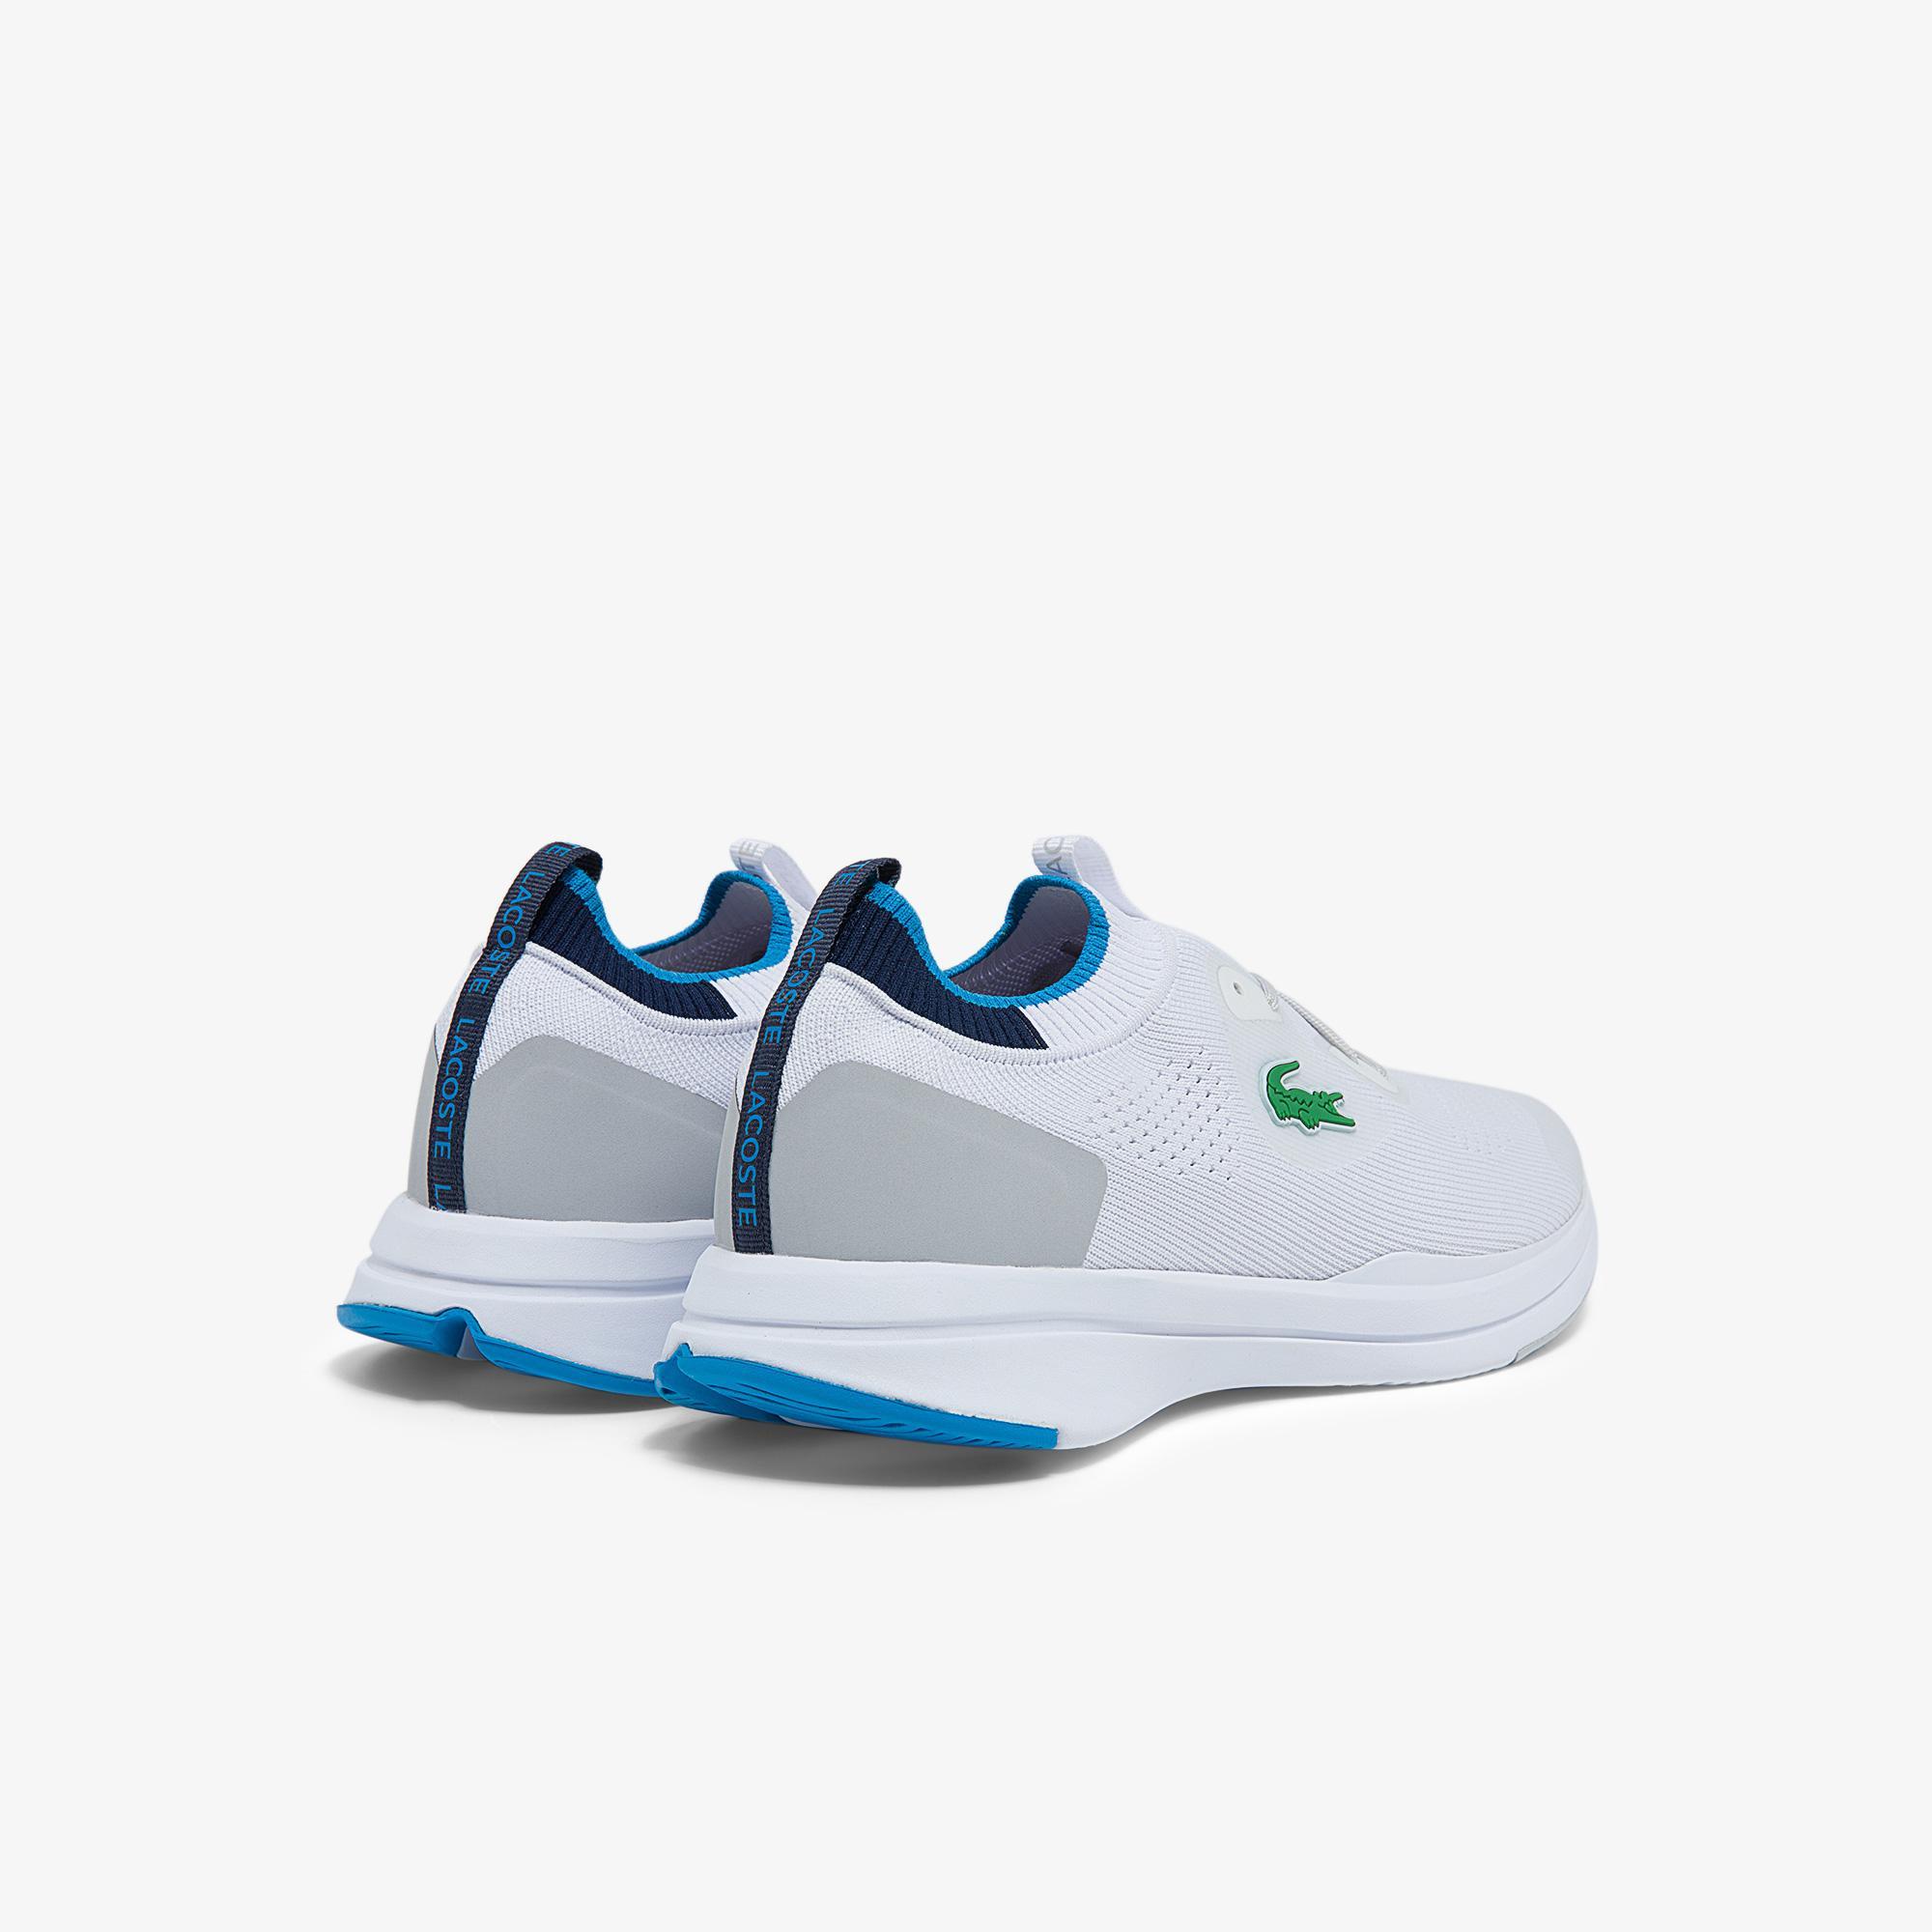 Lacoste Run Spin Knit 0121 1 Sma Erkek Beyaz - Mavi Sneaker